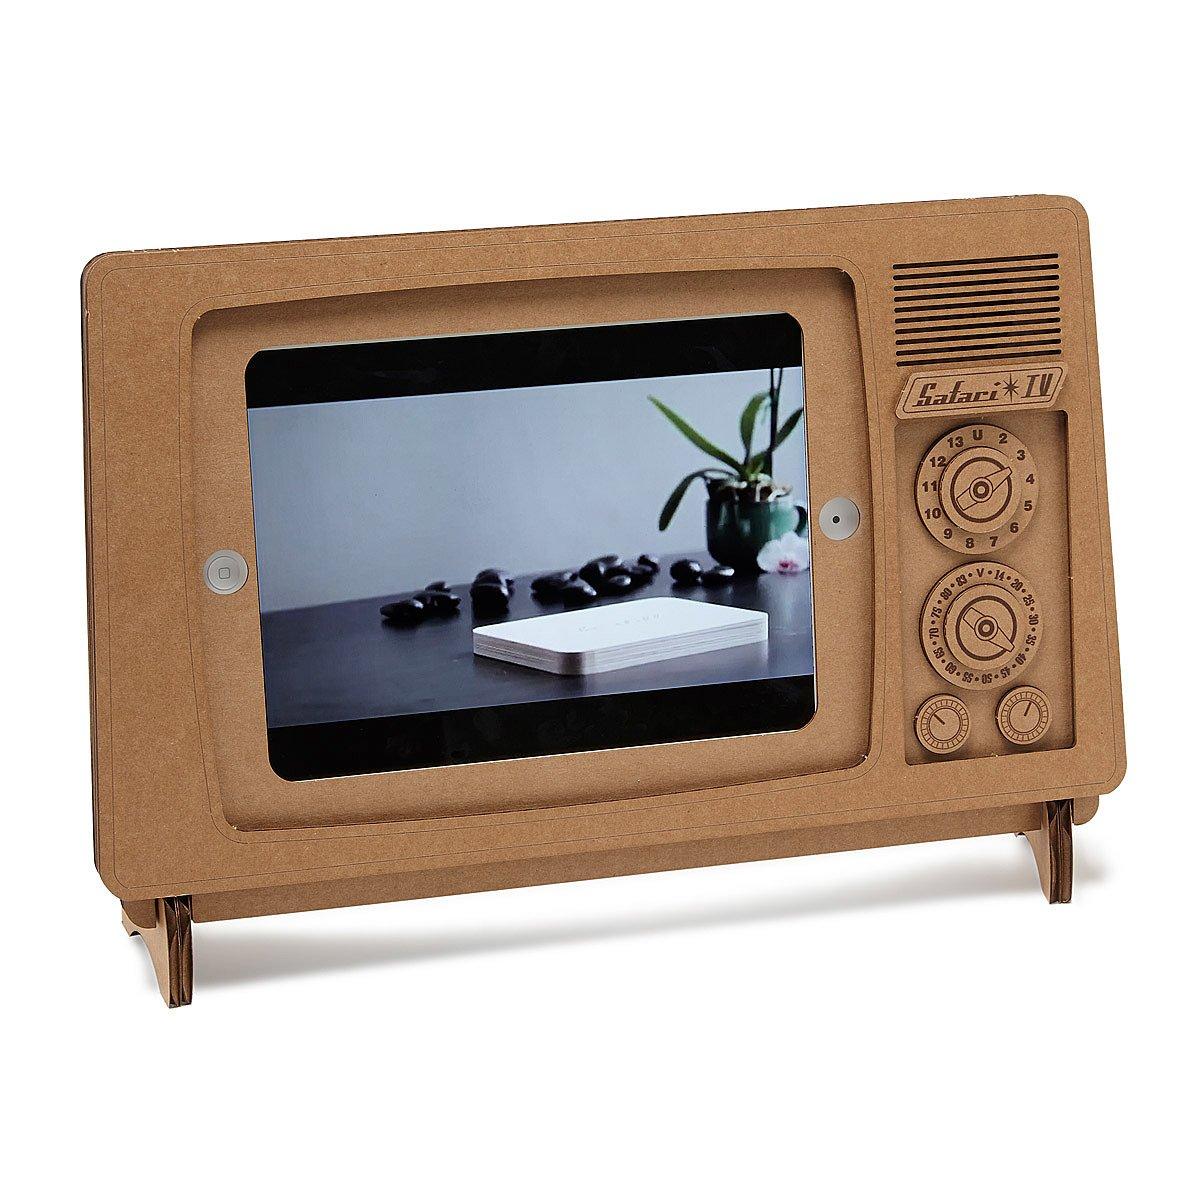 cardboard ipad tv stand recycled ipad stand uncommongoods